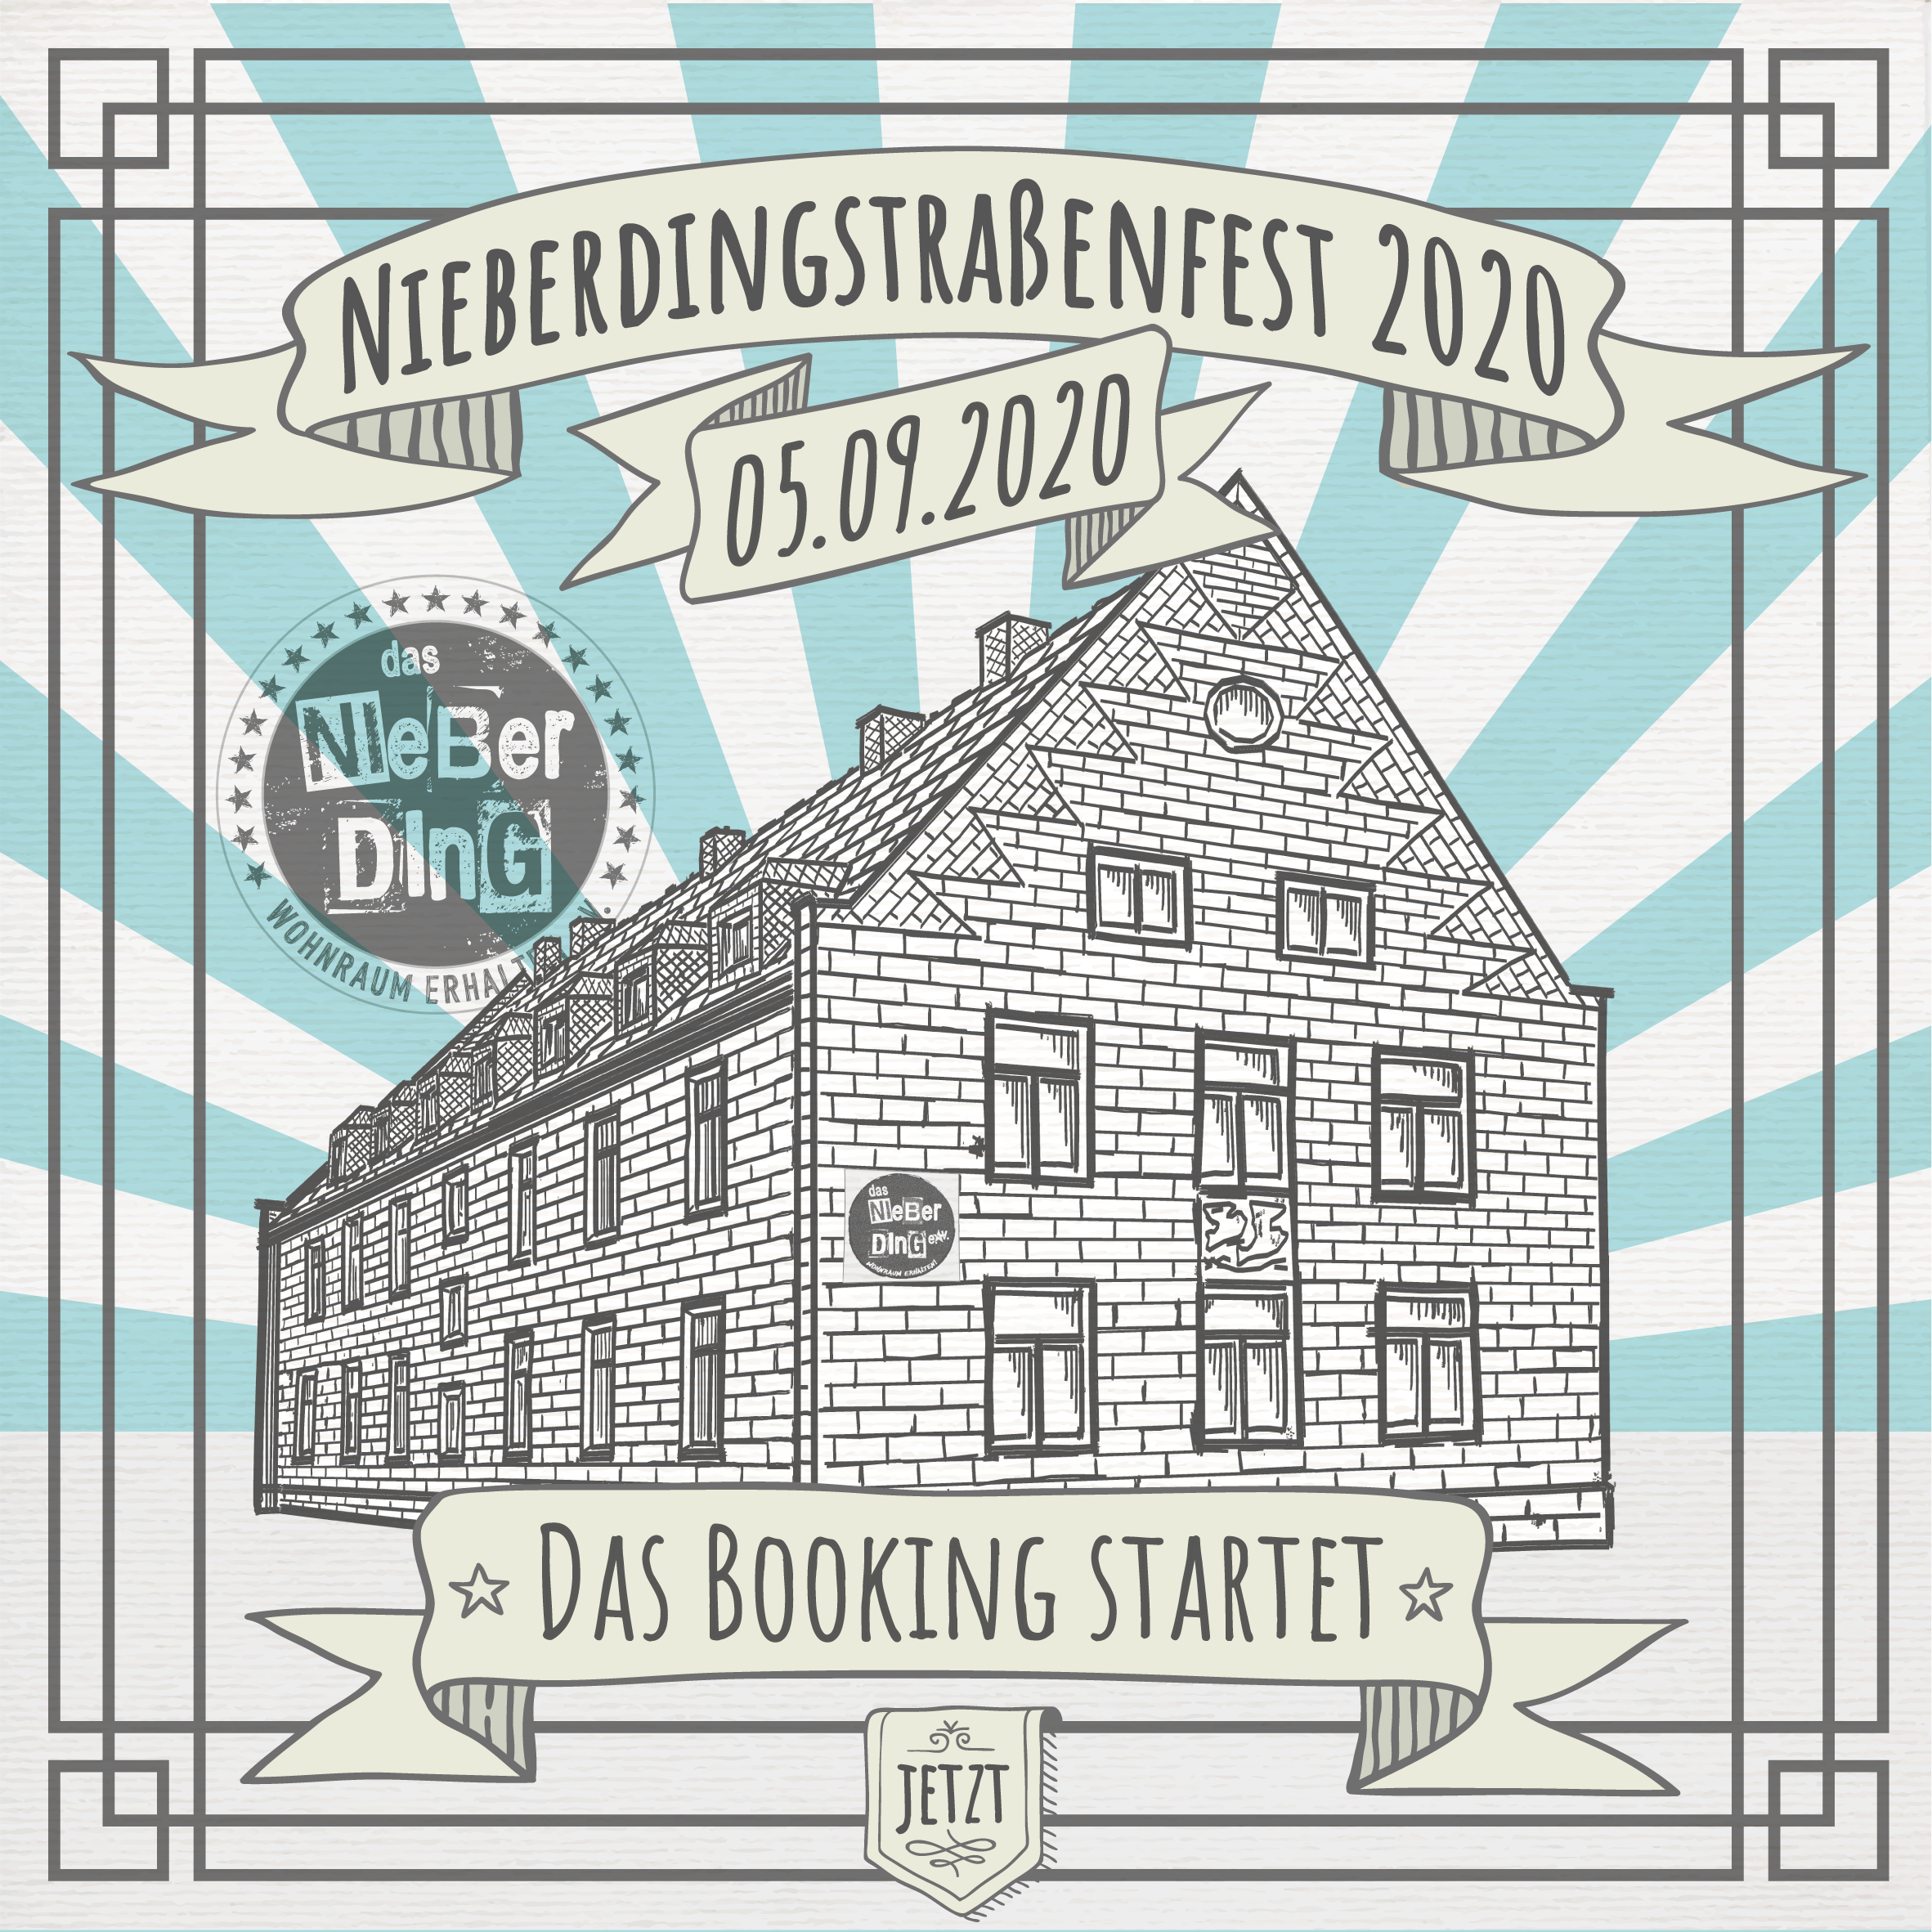 Nieberdingstrassenfest 2020